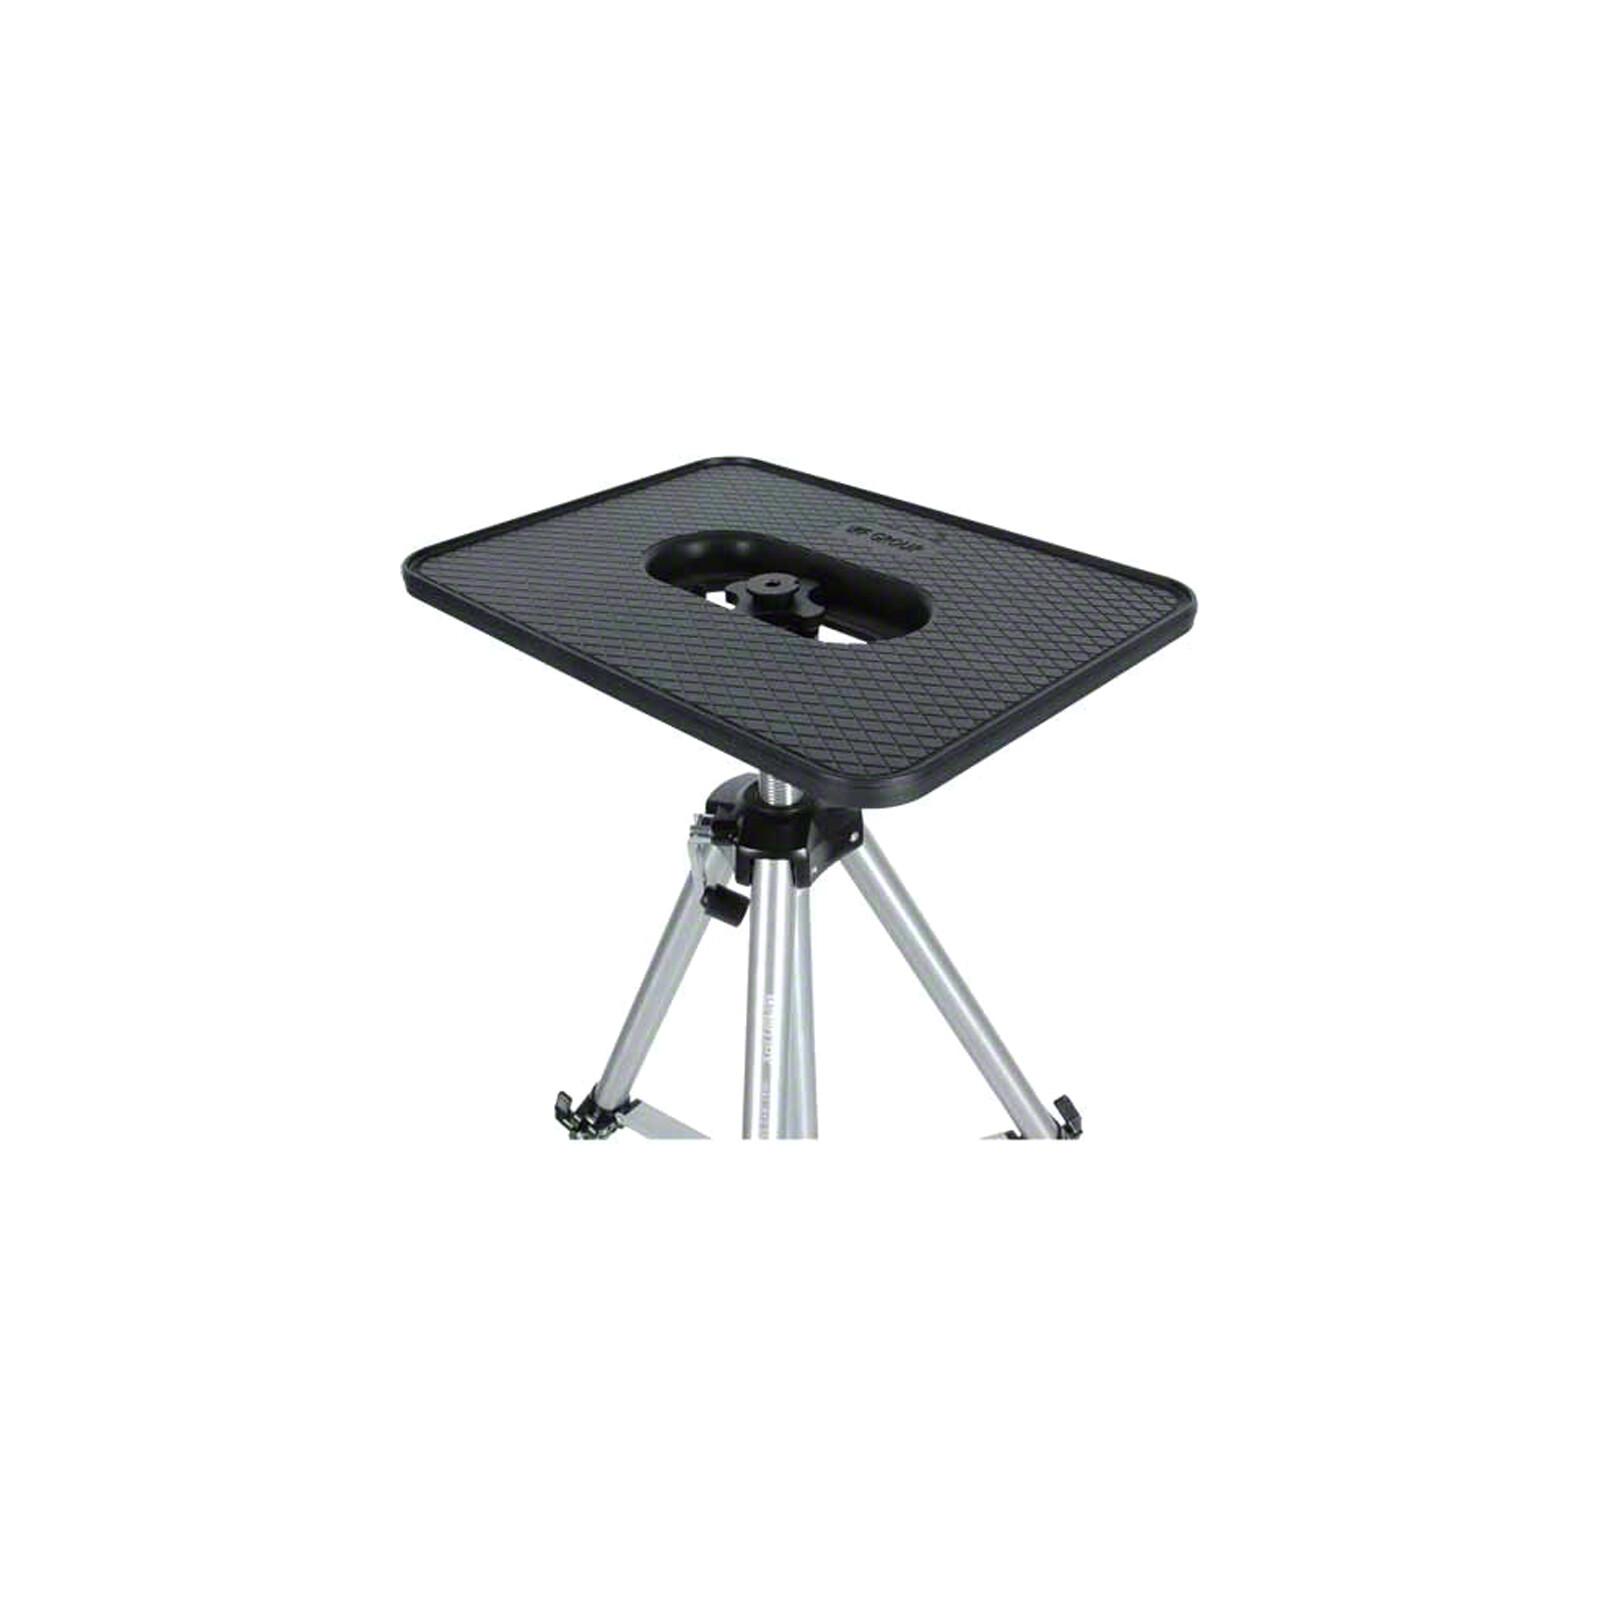 walimex Semi-Pro-StativLaptop-und Projektorplatte